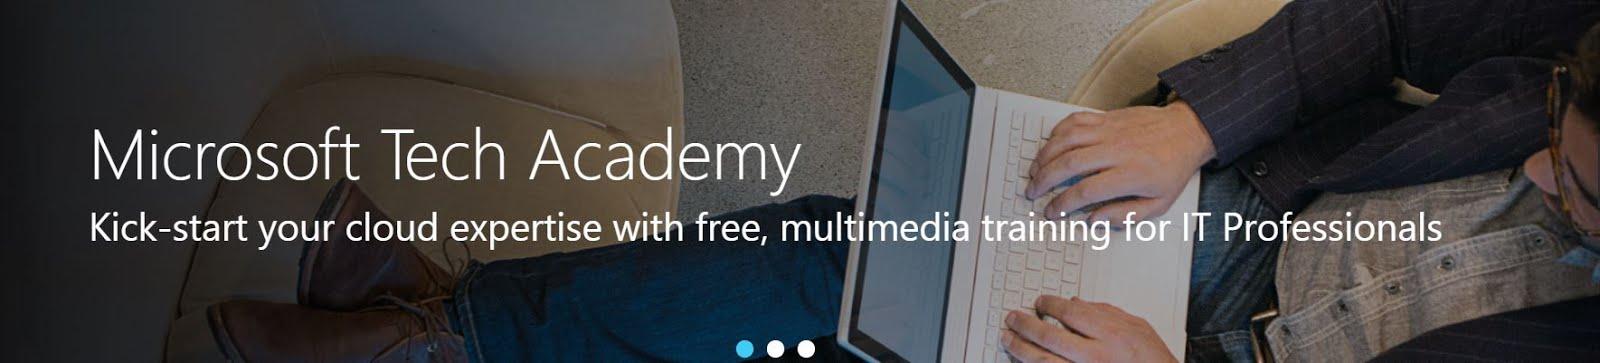 Microsoft Tech Academy